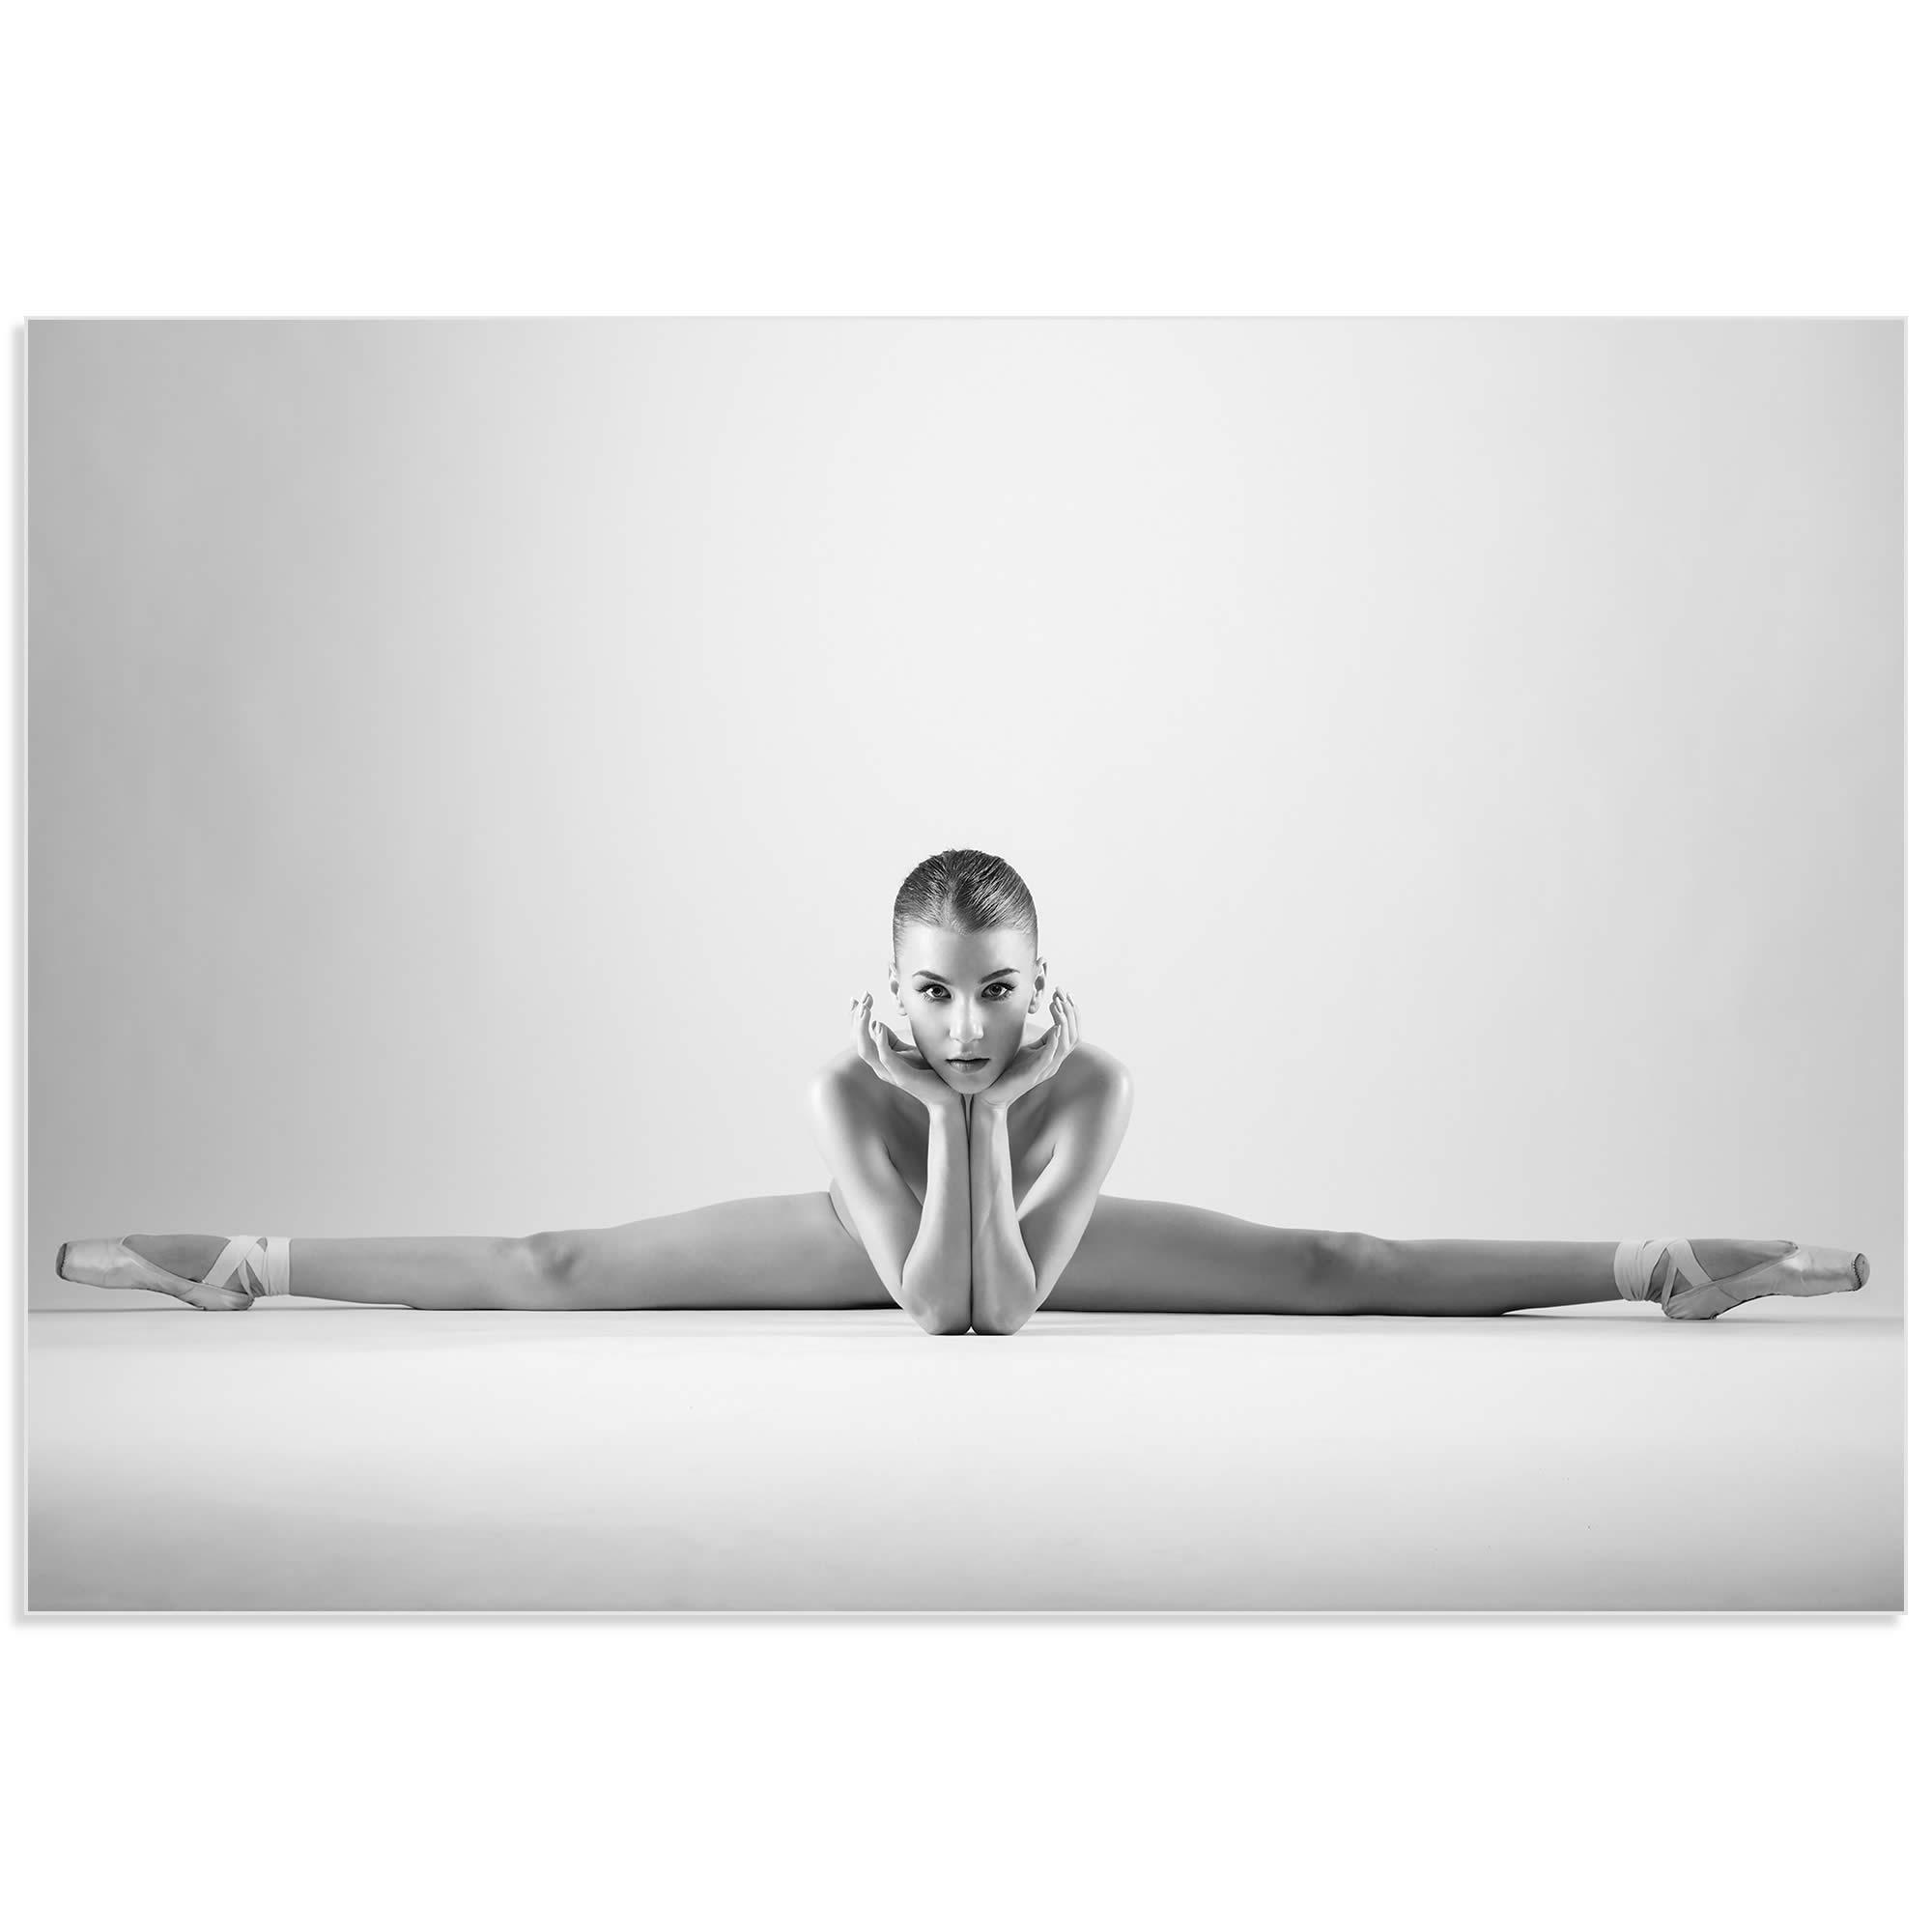 Ballerina Splits by Arkadiusz Branicki - Classy Nude Photography on Metal or Acrylic - Alternate View 2